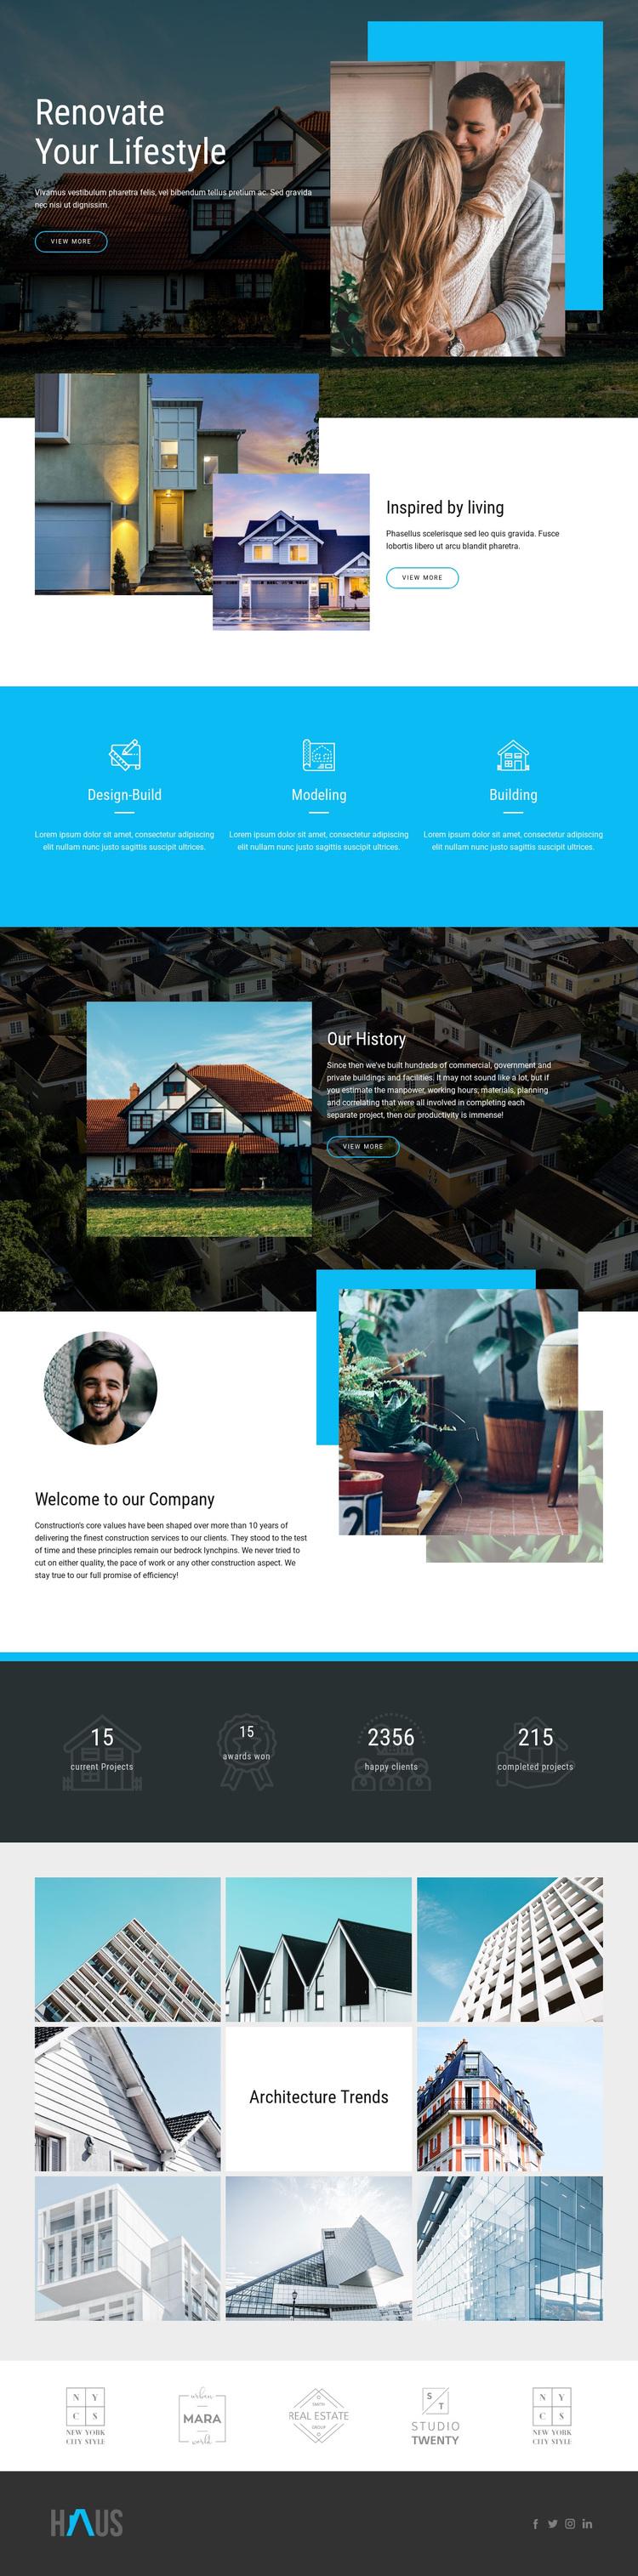 Renovate real estate Template